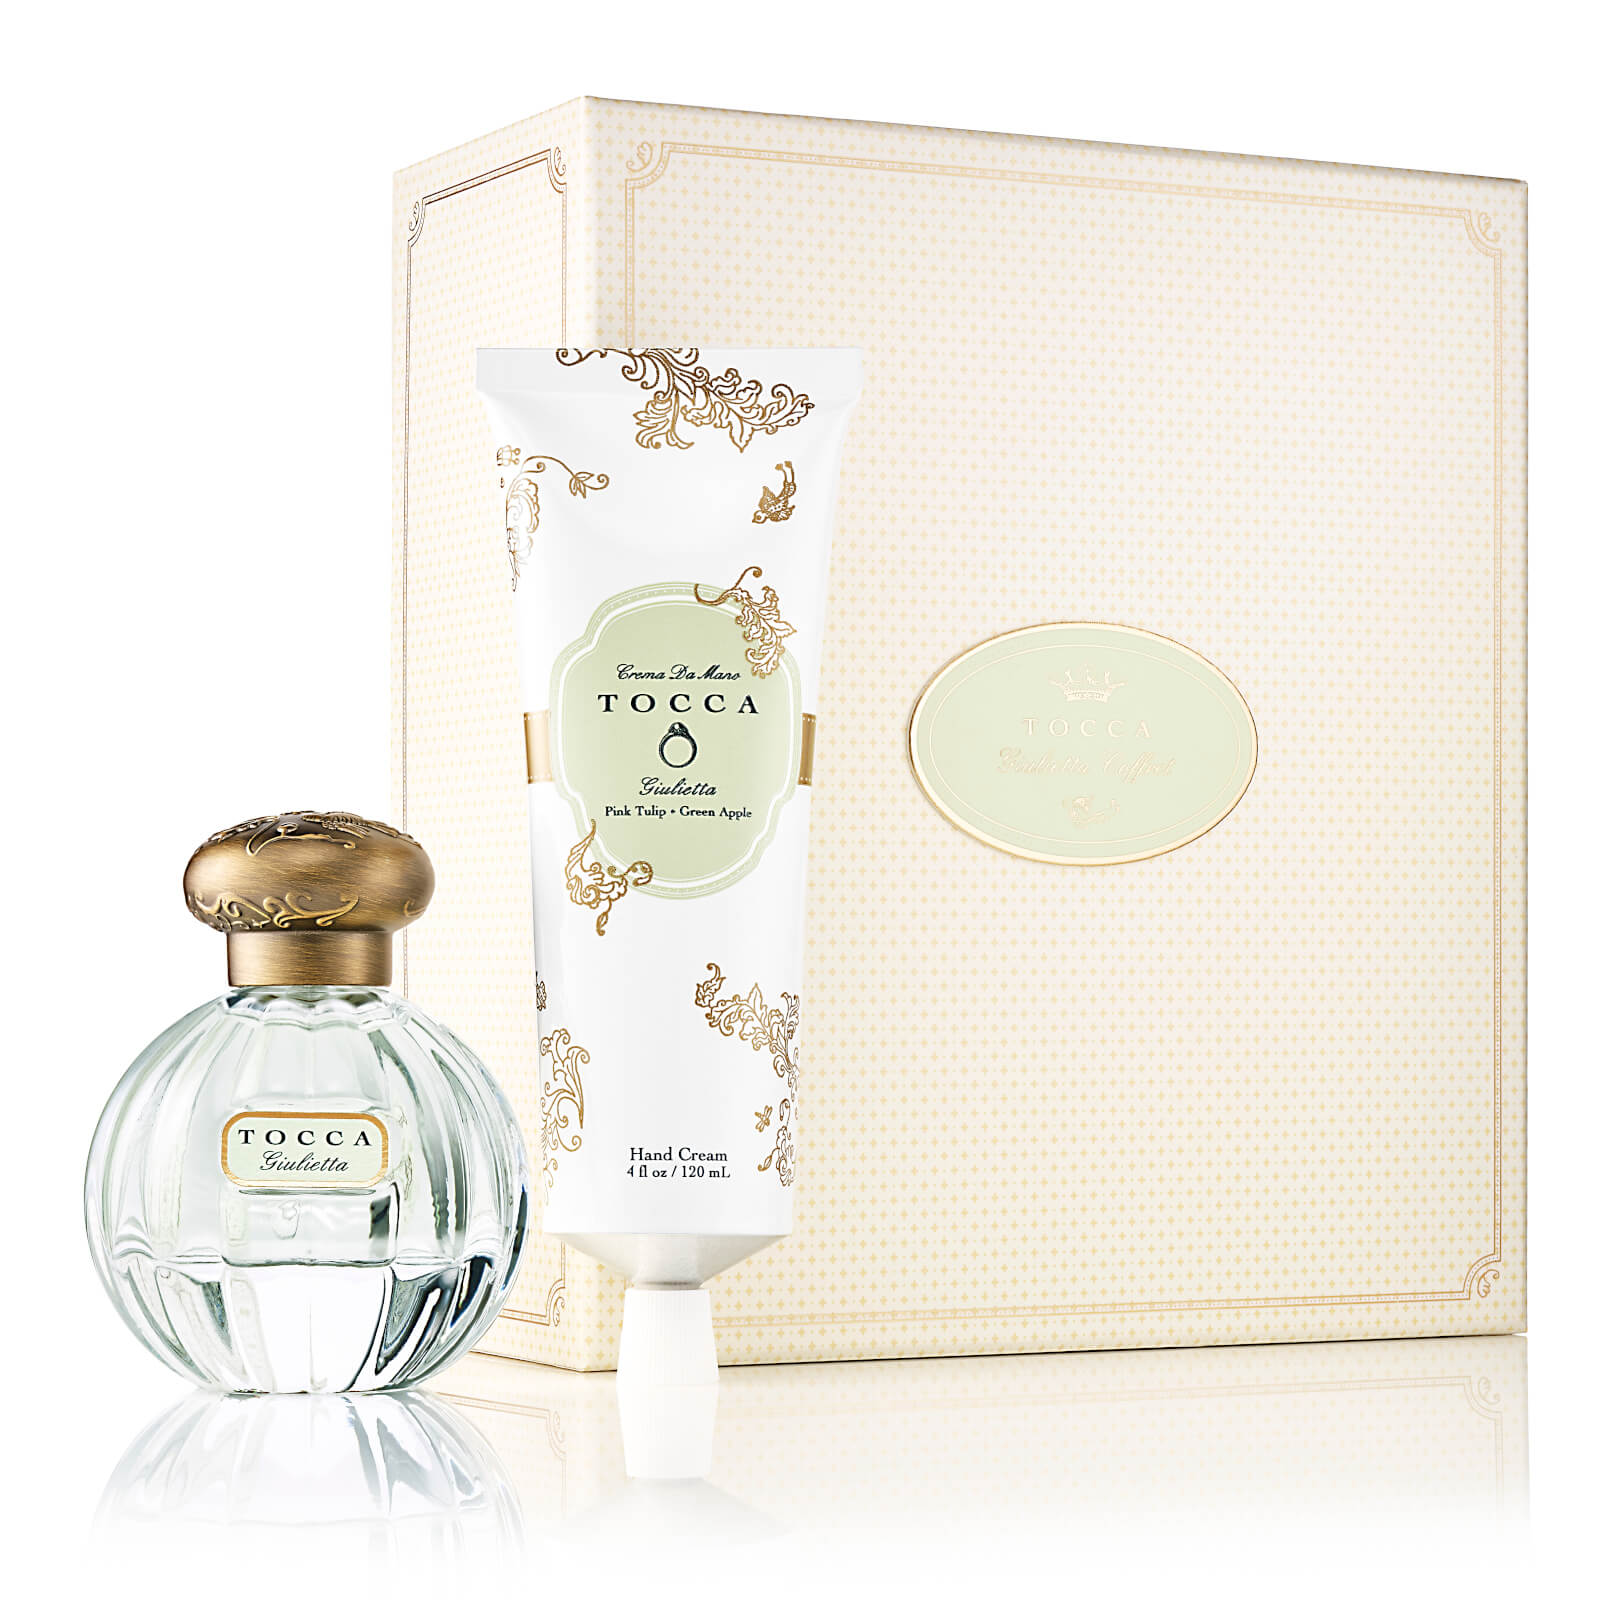 Tocca Guilietta Eau de Parfum and Hand Cream Set (Worth £98.00)